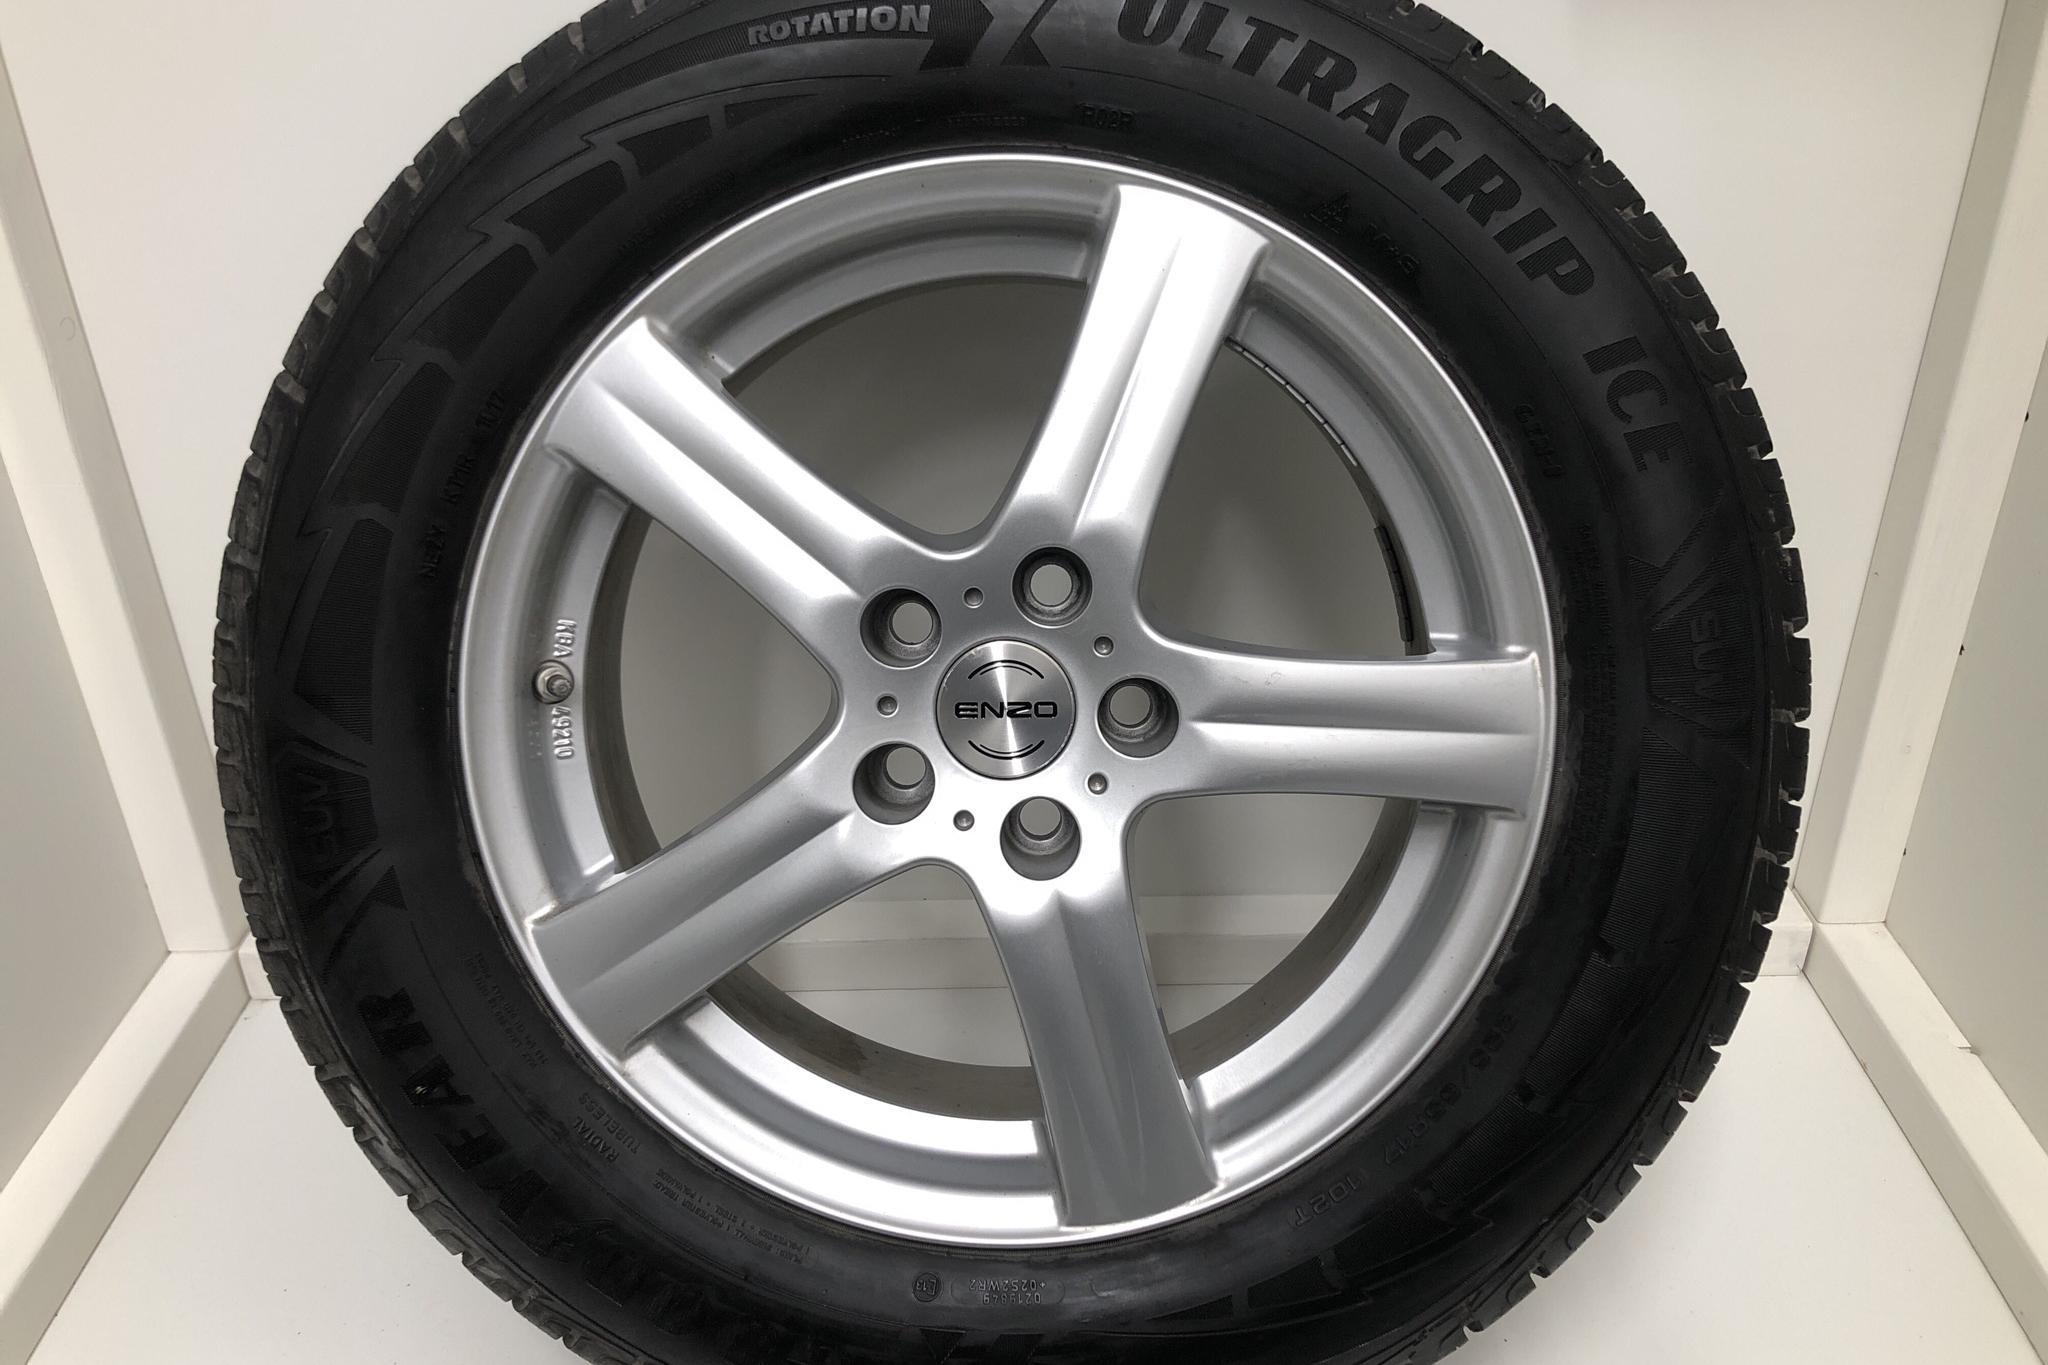 Toyota RAV4 2.5 HSD AWD (197hk) - 69 060 km - Automatic - black - 2017